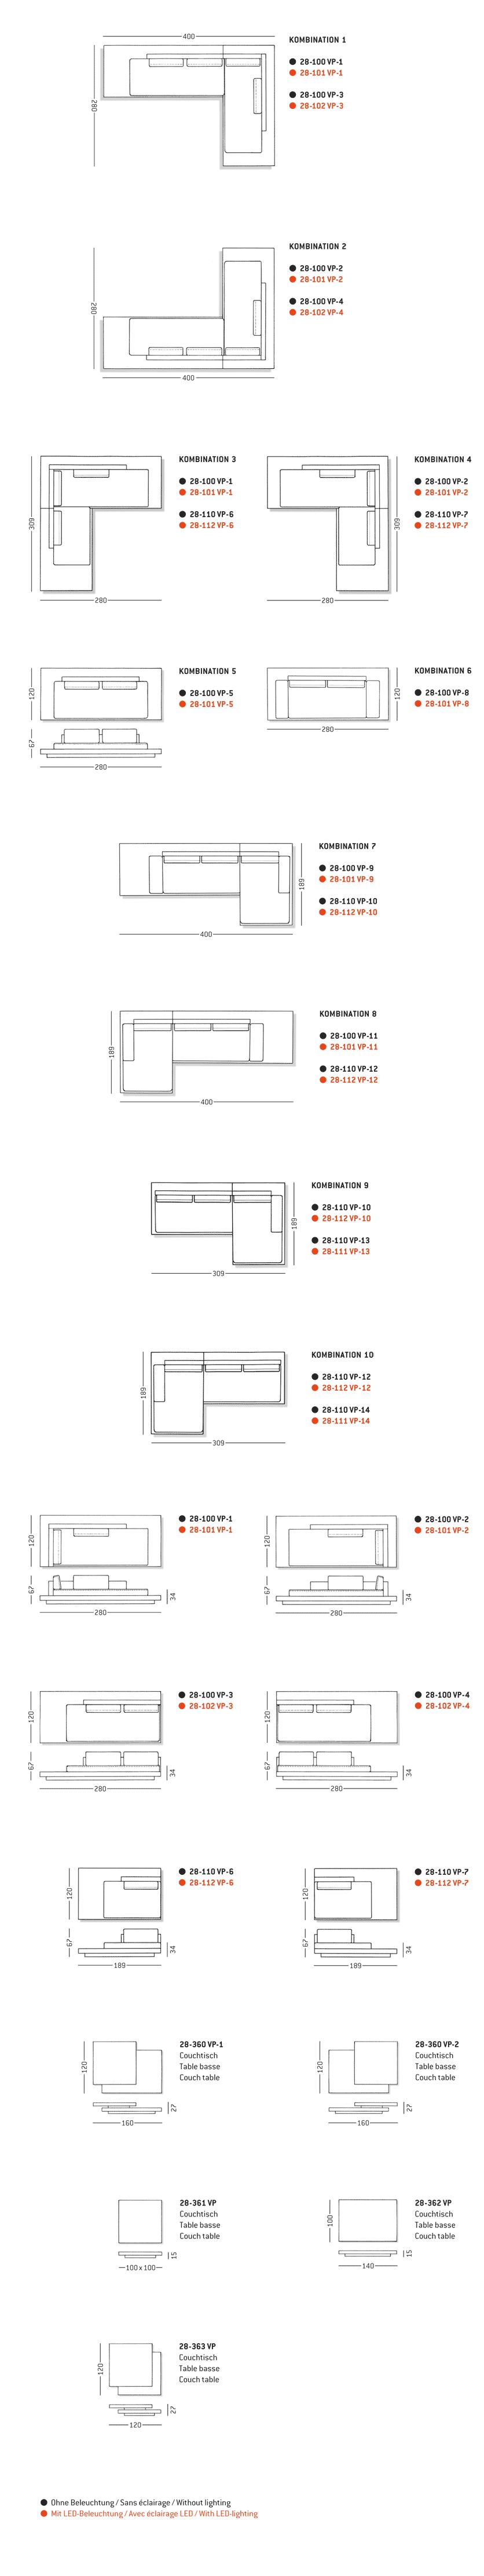 RAUSCH - Platform